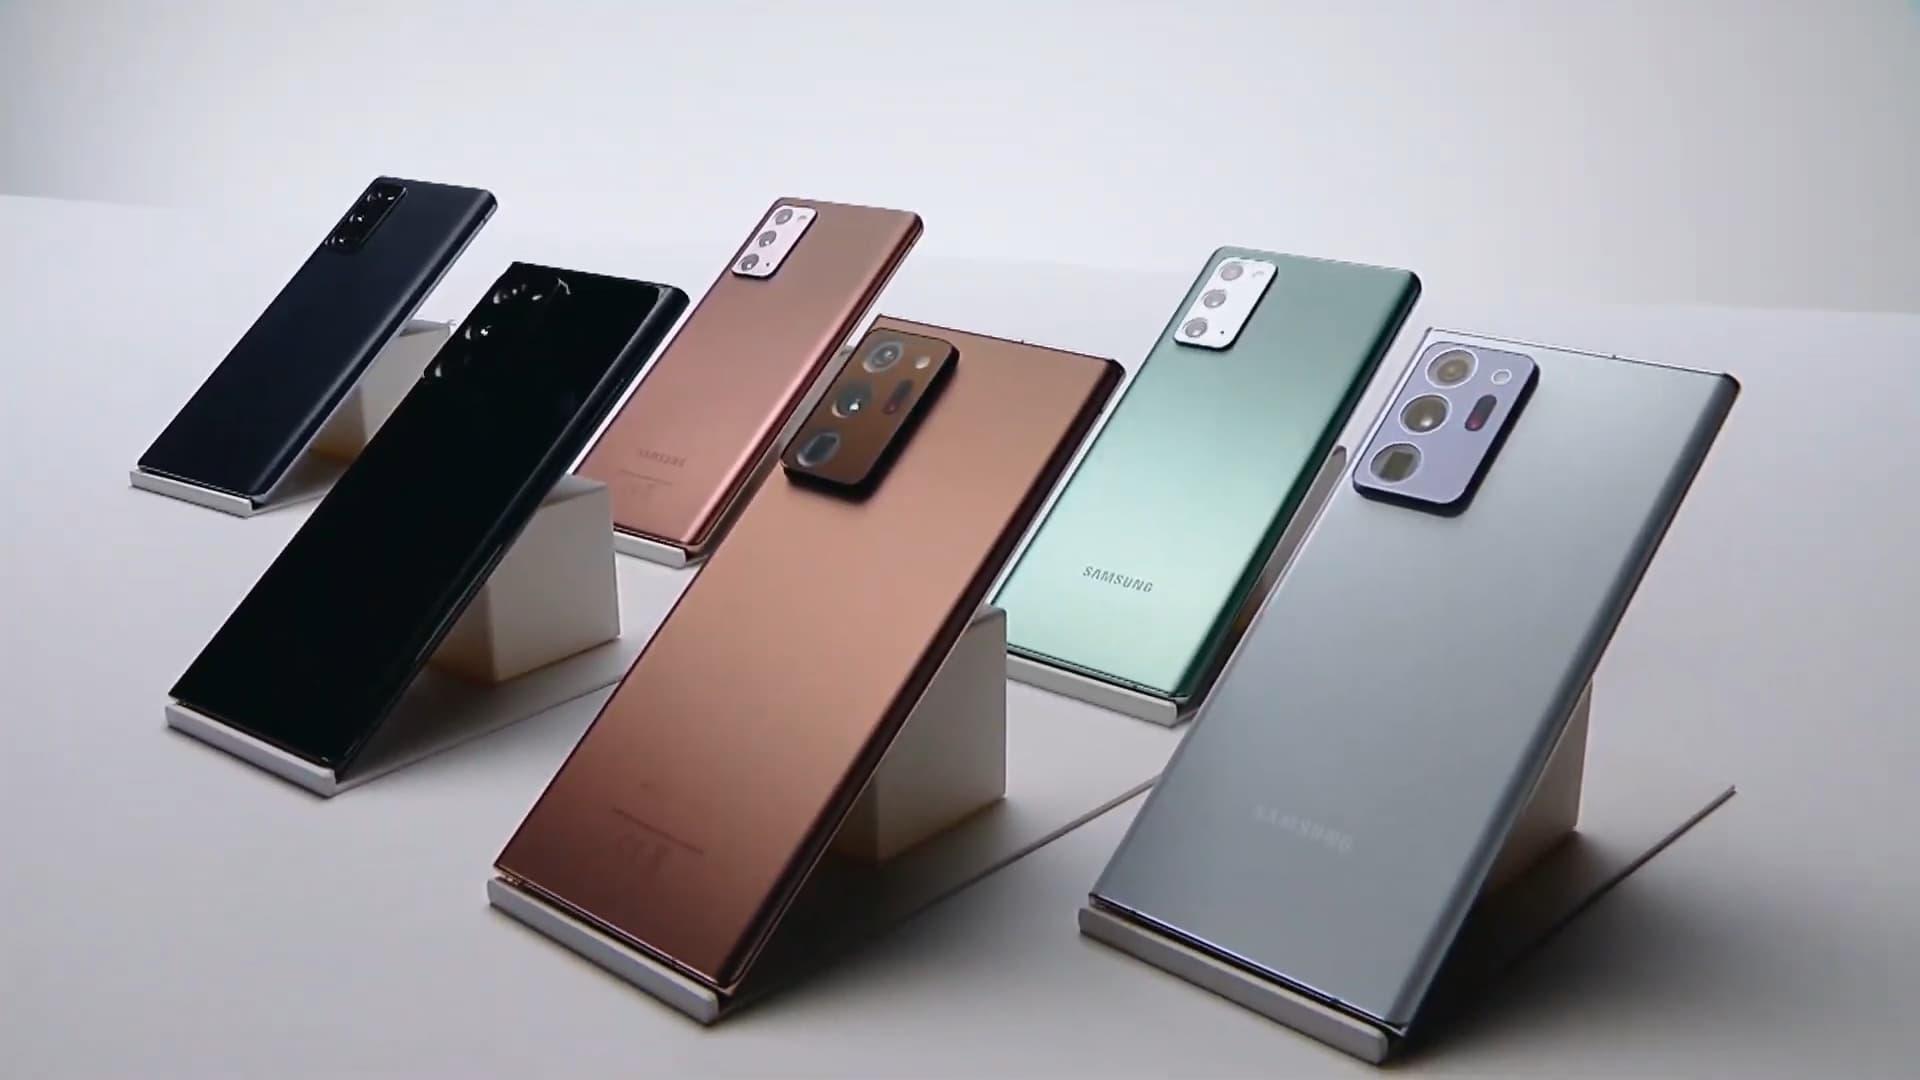 Samsung Galaxy Note 20 Ultra Processor and storage